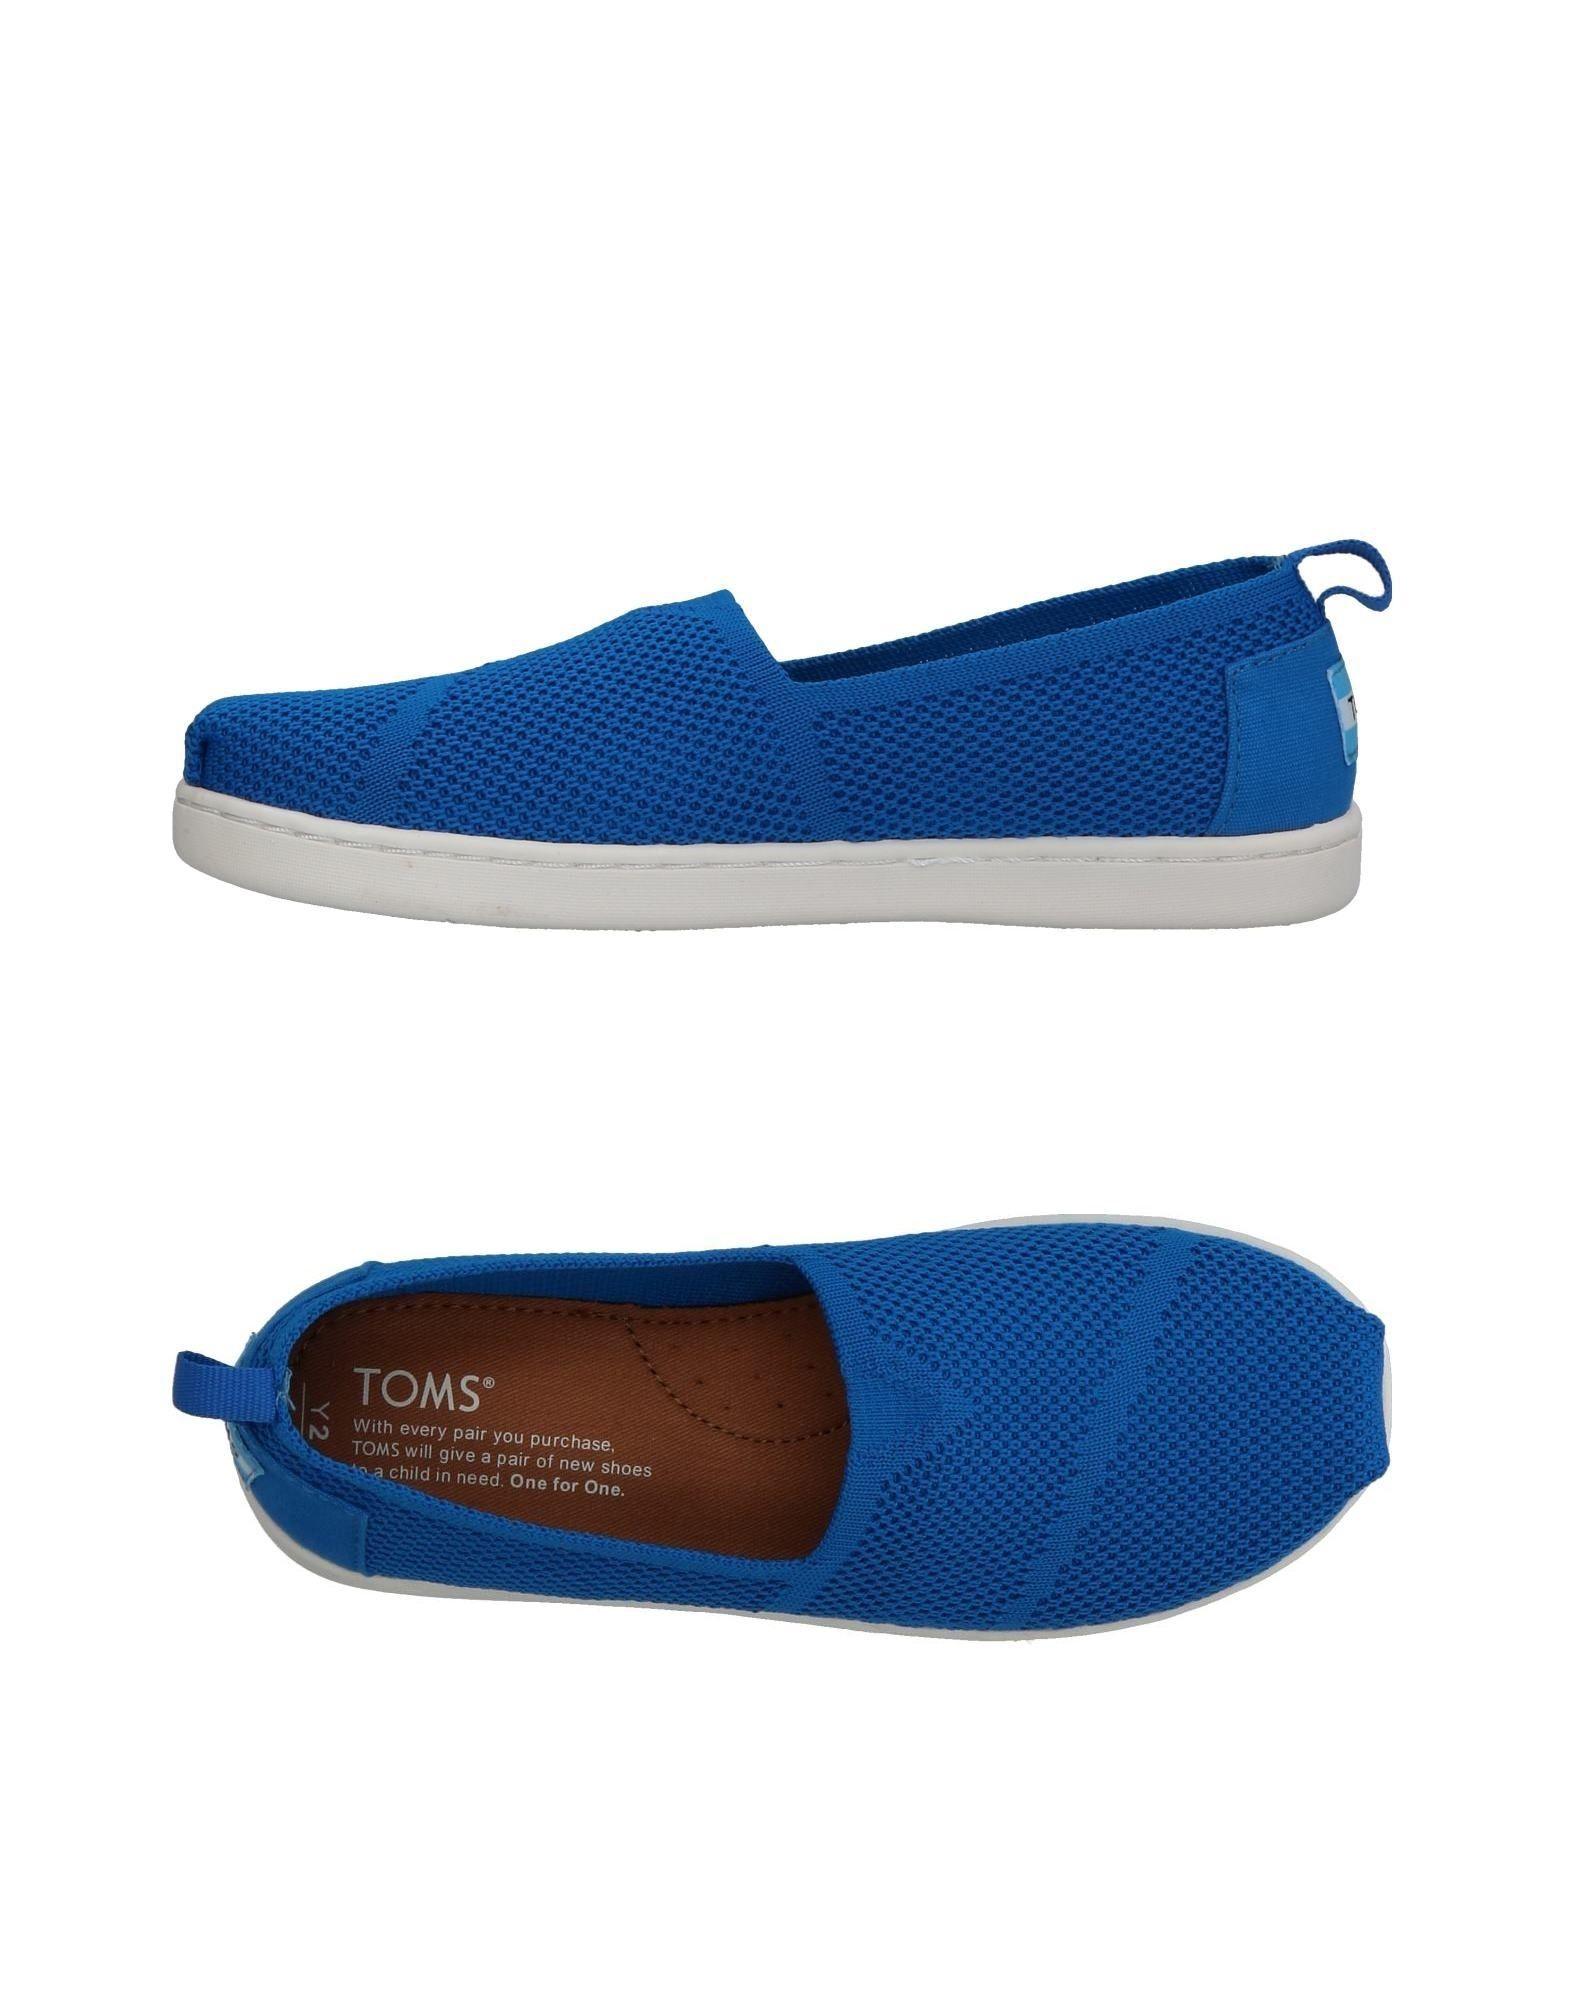 TOMS Низкие кеды и кроссовки кеды кроссовки низкие element topaz navy paisley